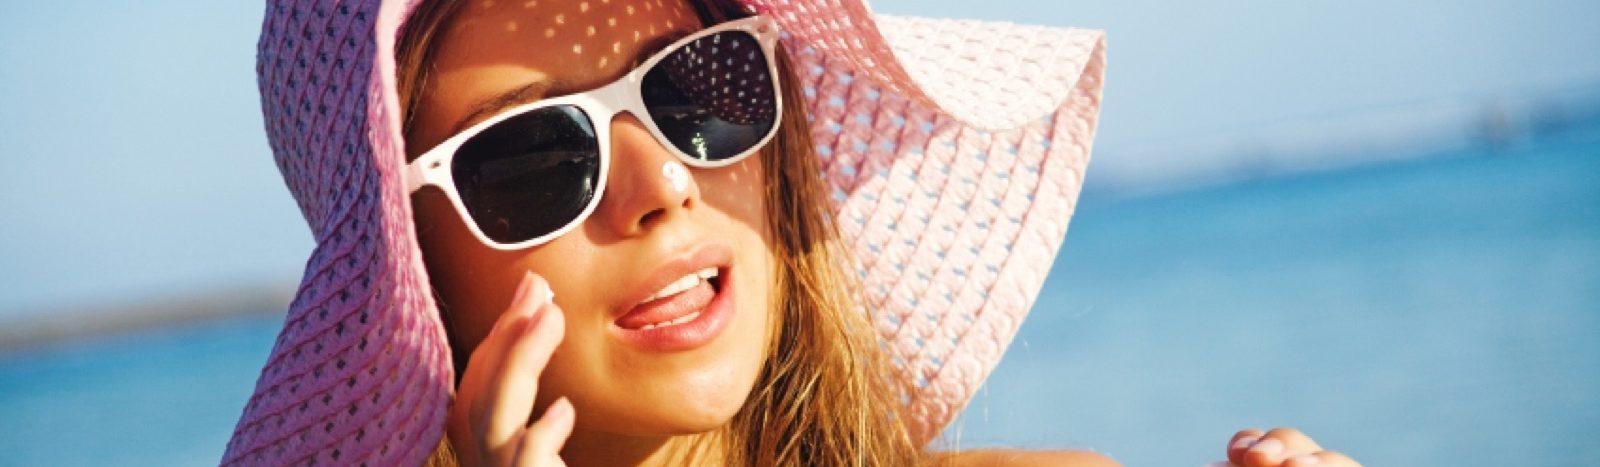 Haut-Sommerstress-erholen